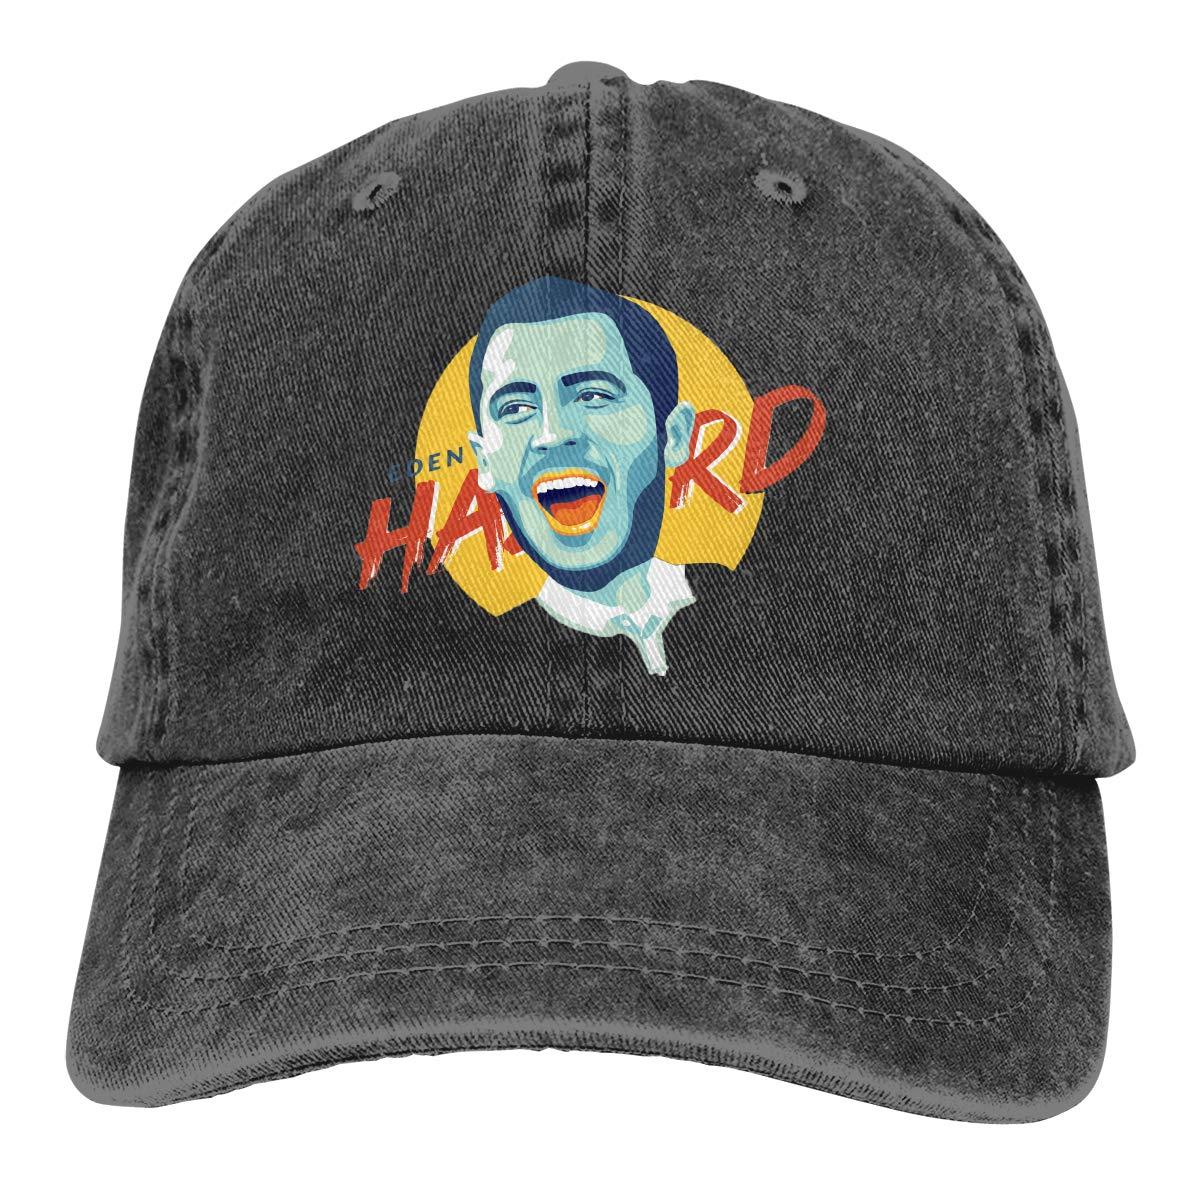 DeniCar Unisex Adjustable Baseball Caps Eden-Hazard-Happy-Face-Logo Cowboy Skull Cap